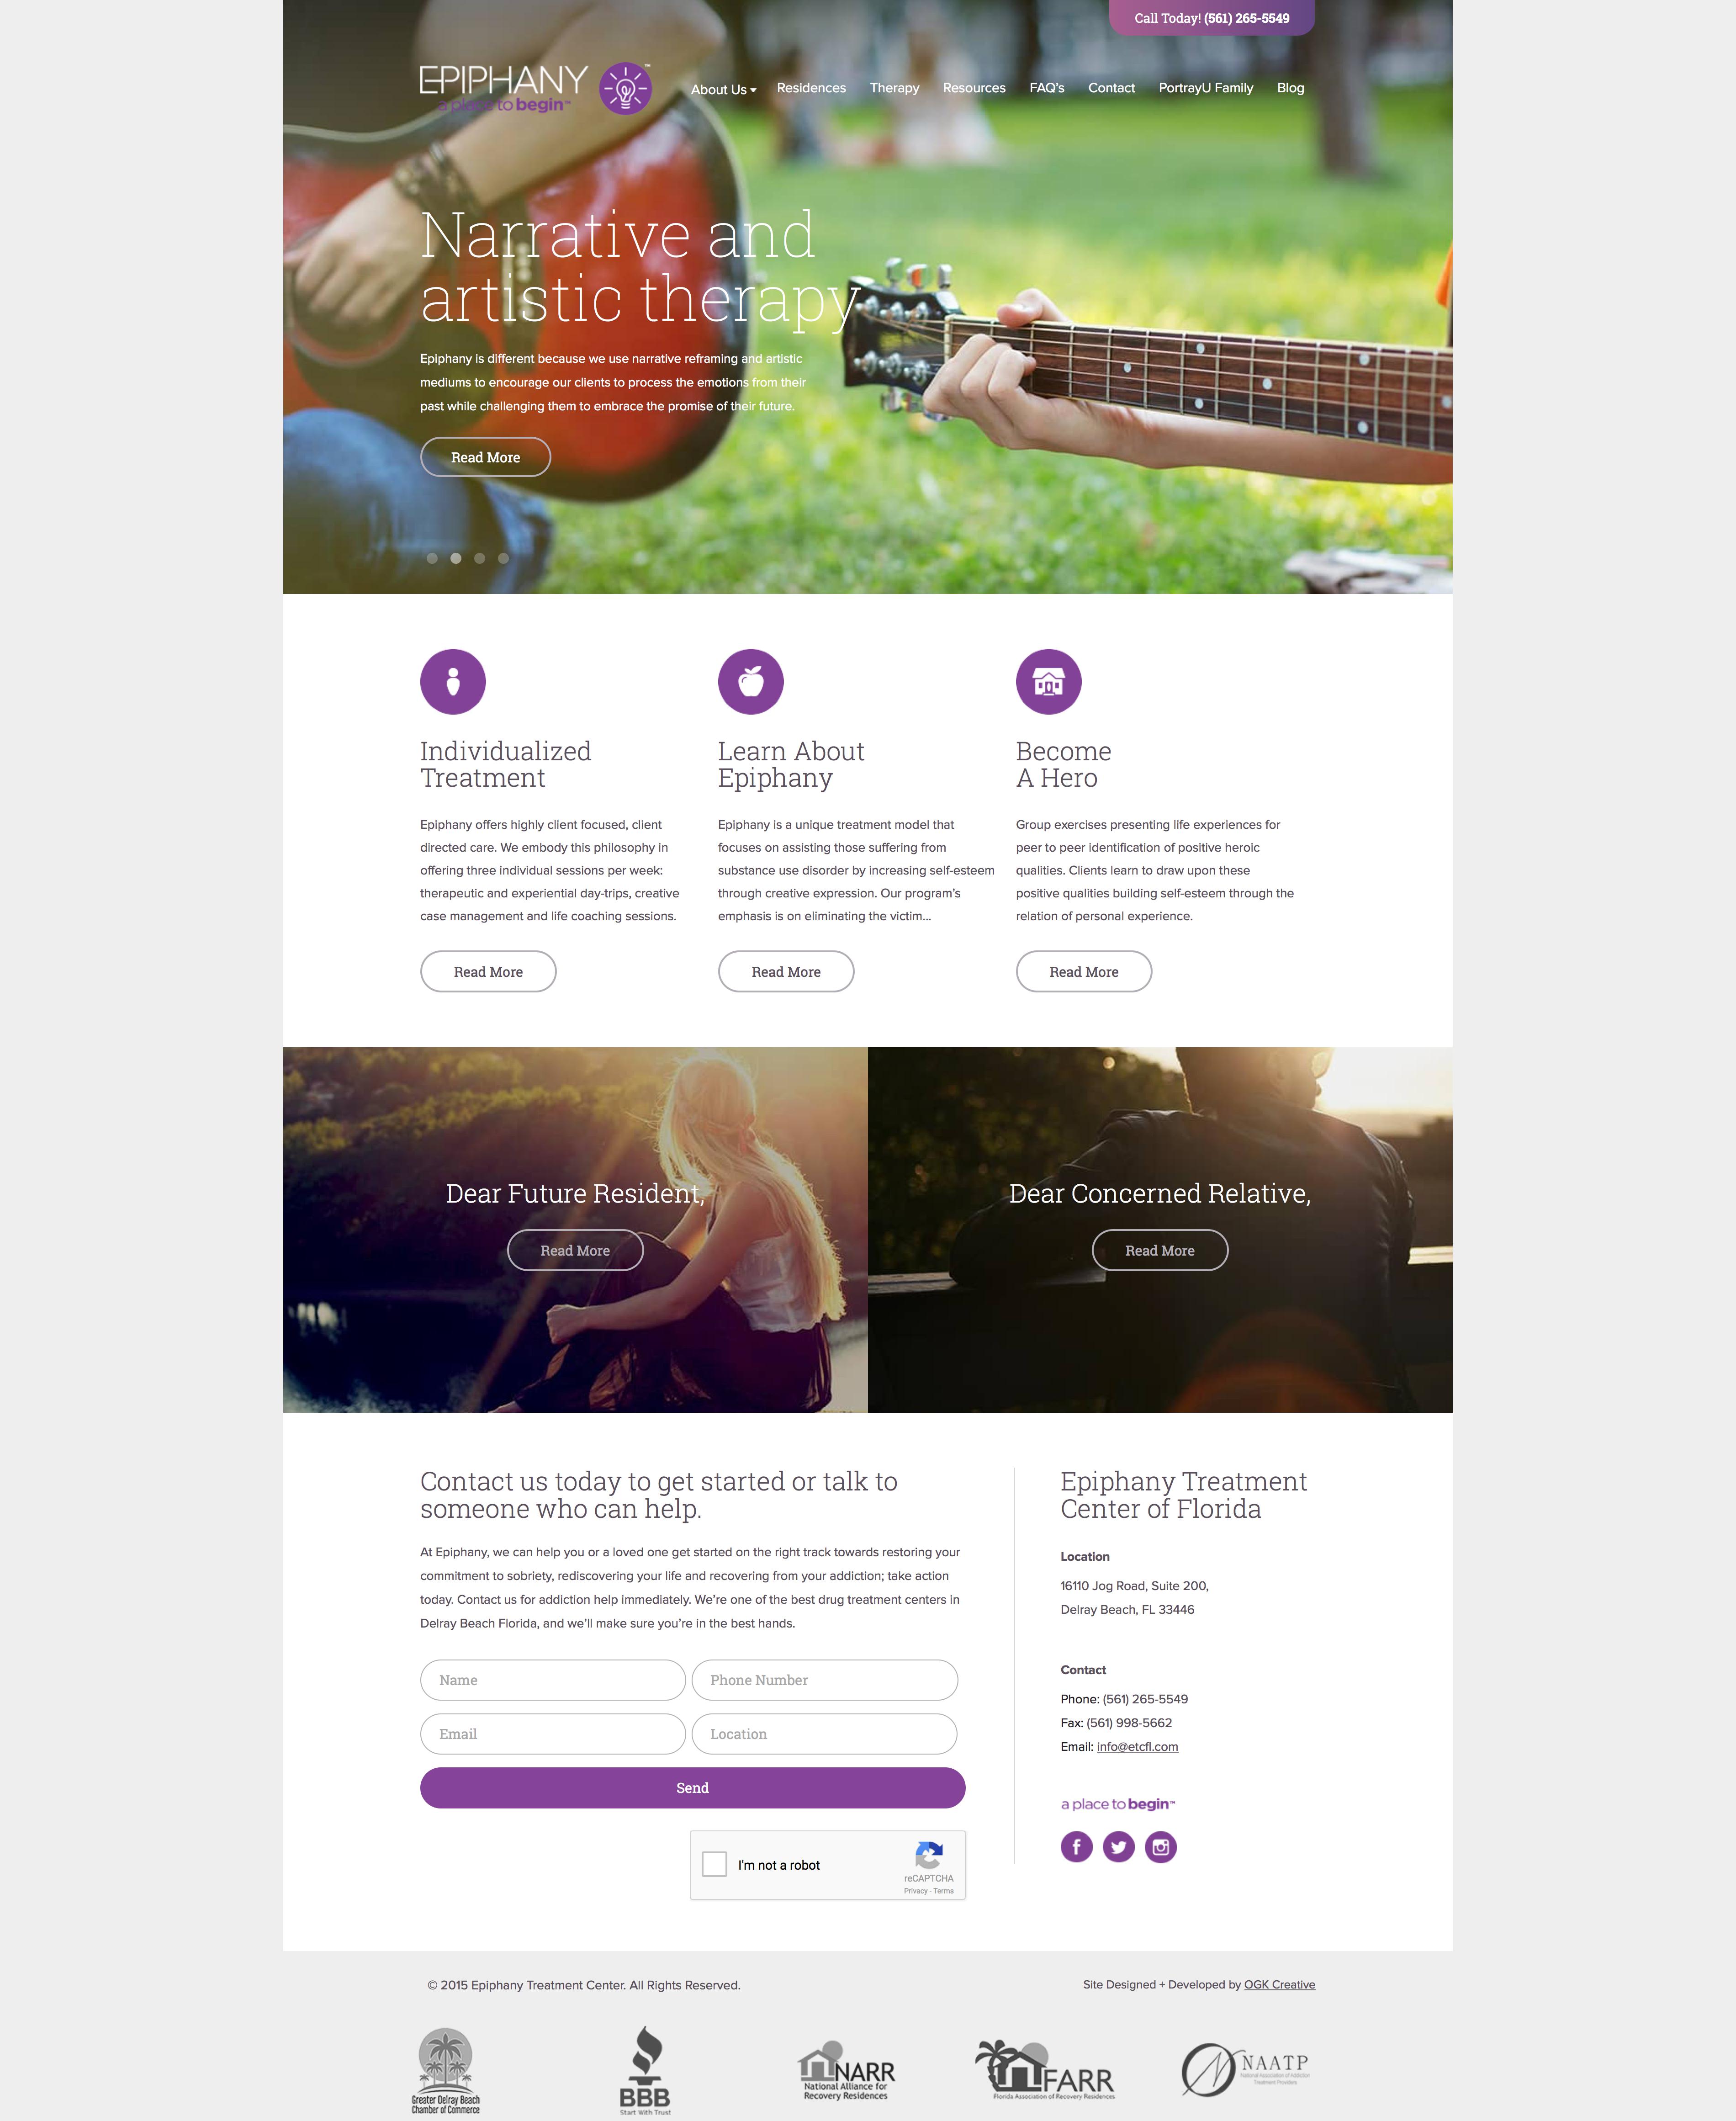 epiphany-homepage-full